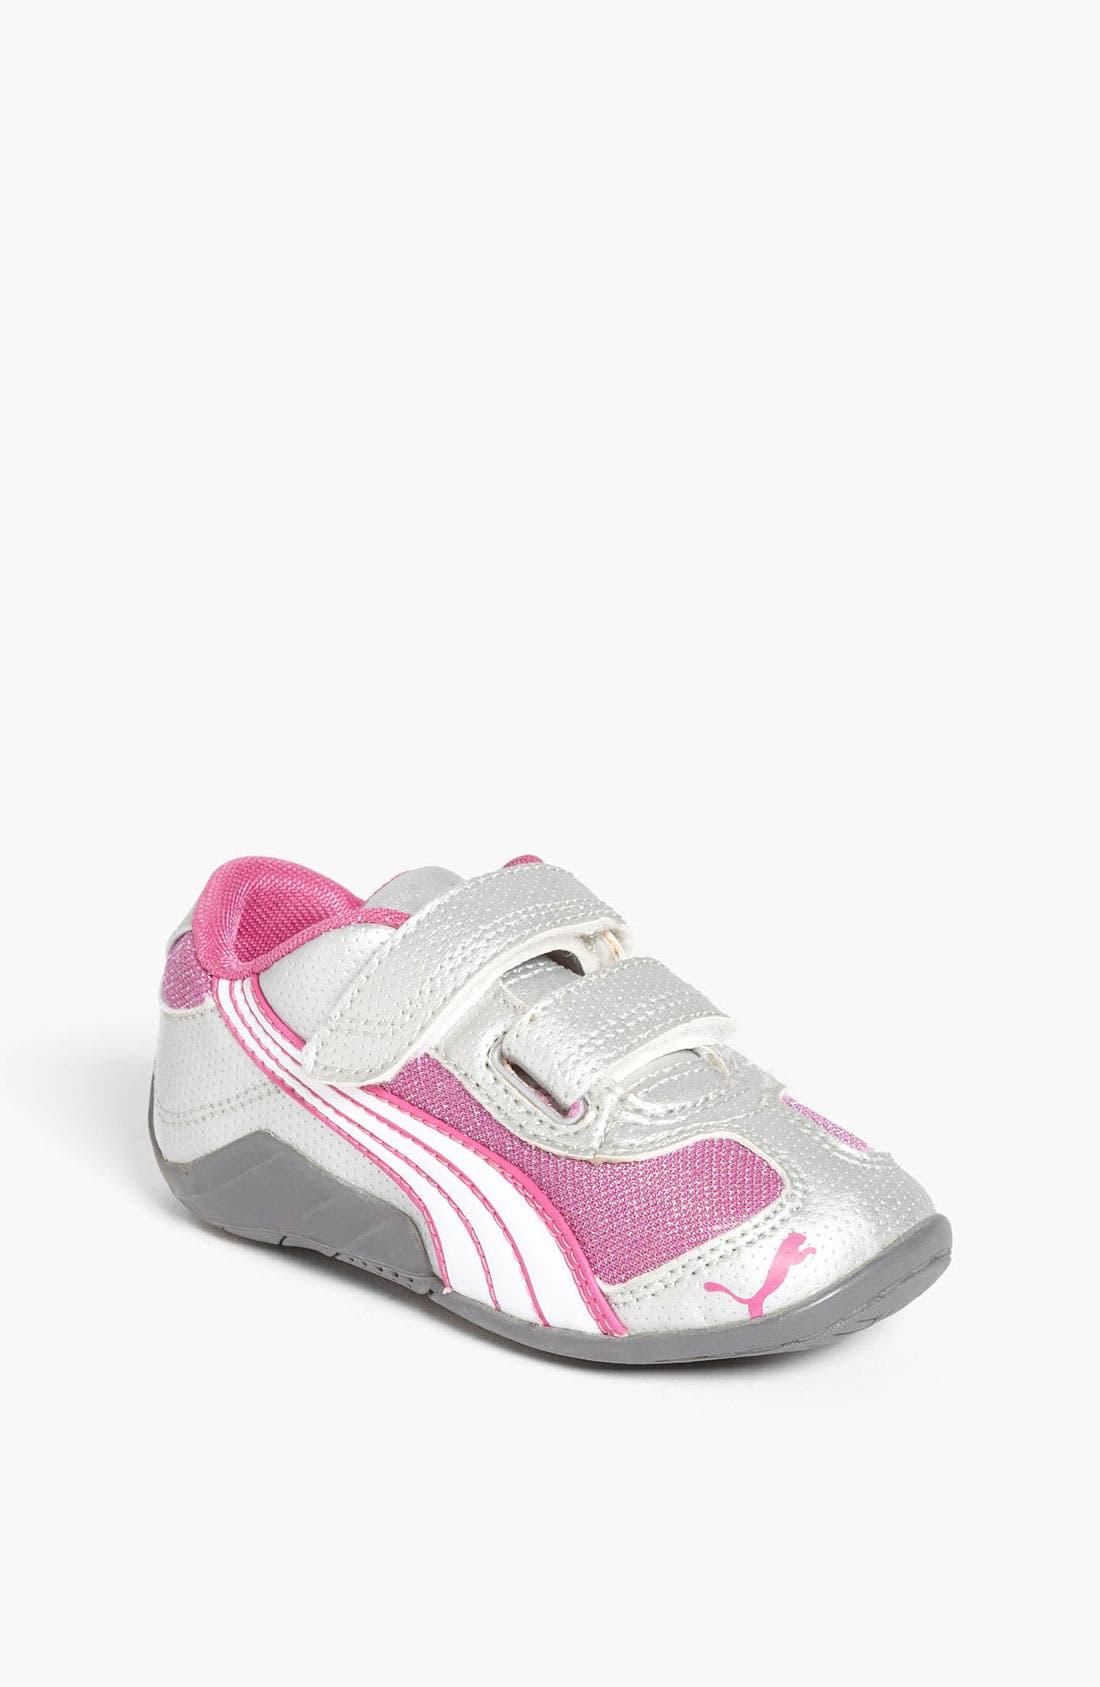 Alternate Image 1 Selected - PUMA 'Millennius Glitter' Sneaker (Baby, Walker & Toddler)